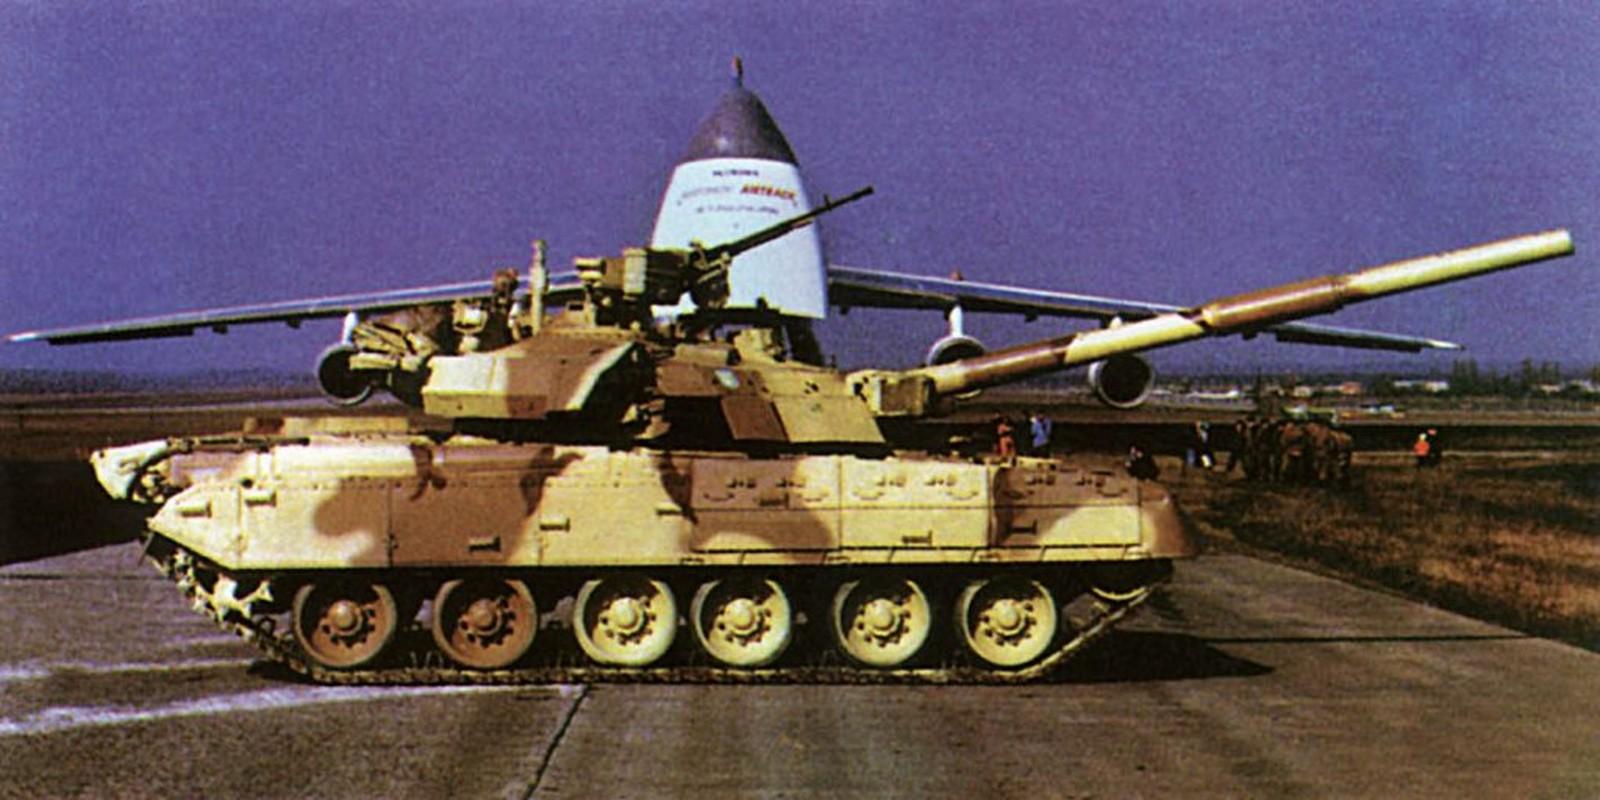 Tai sao T-84 Oplot-M cua Ukraine la xe tang tot nhat chau Au?-Hinh-9